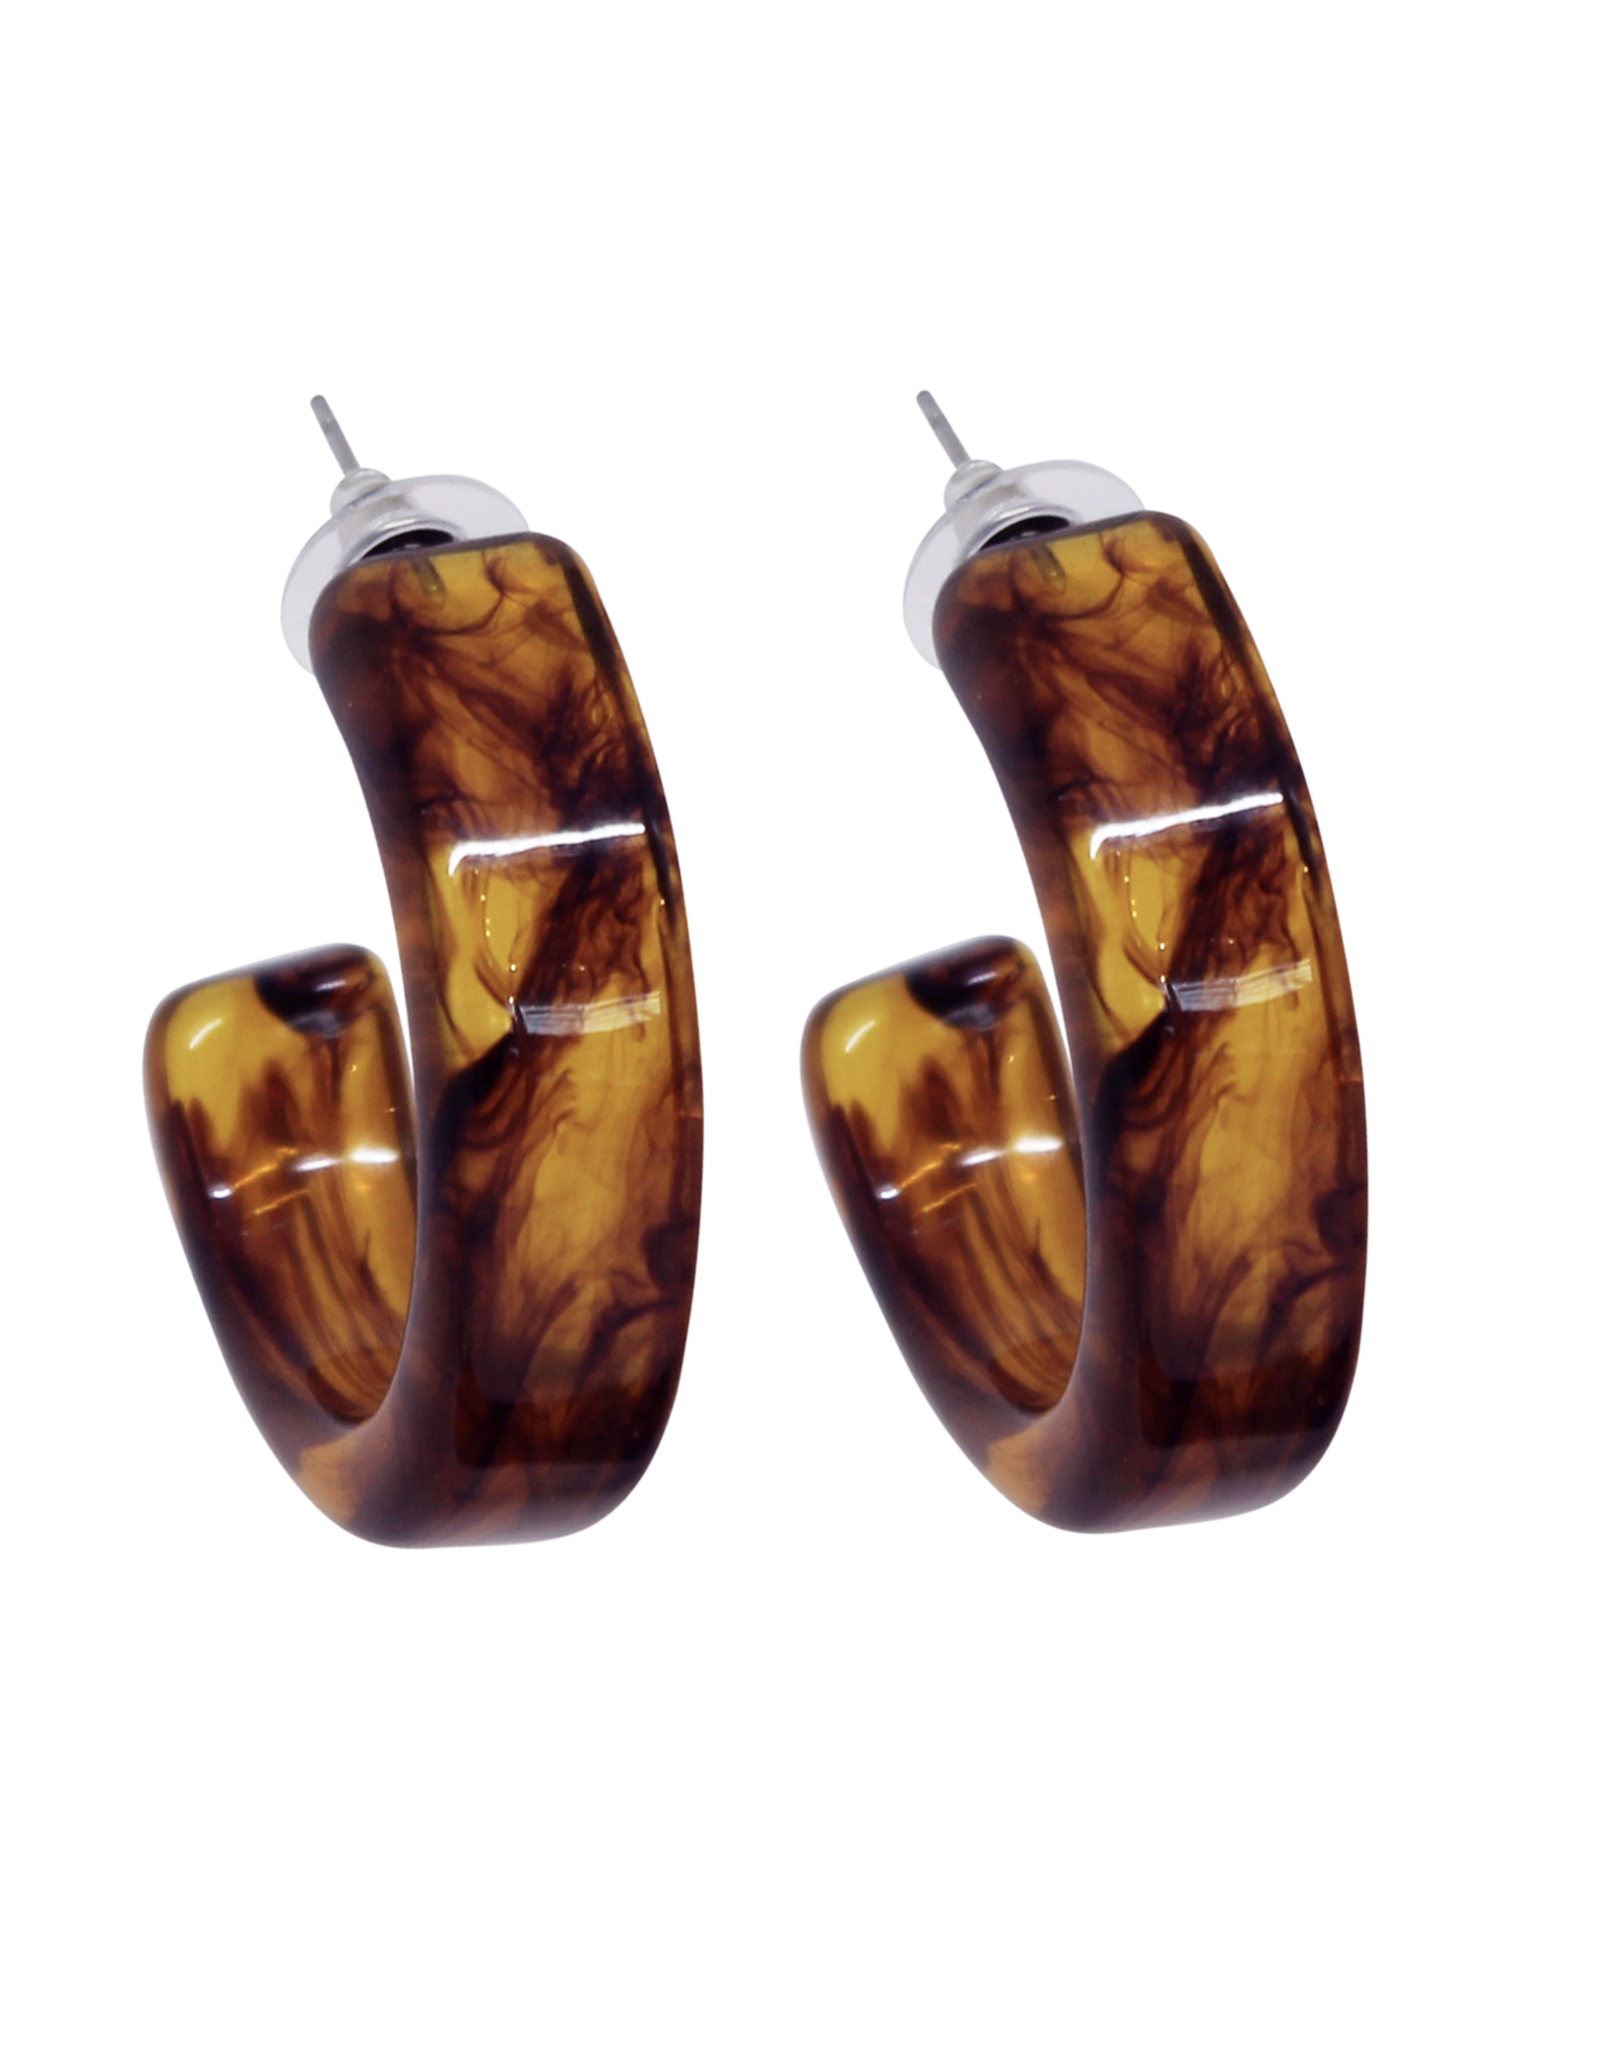 Vayu Jewels Camil Hoops - Amber